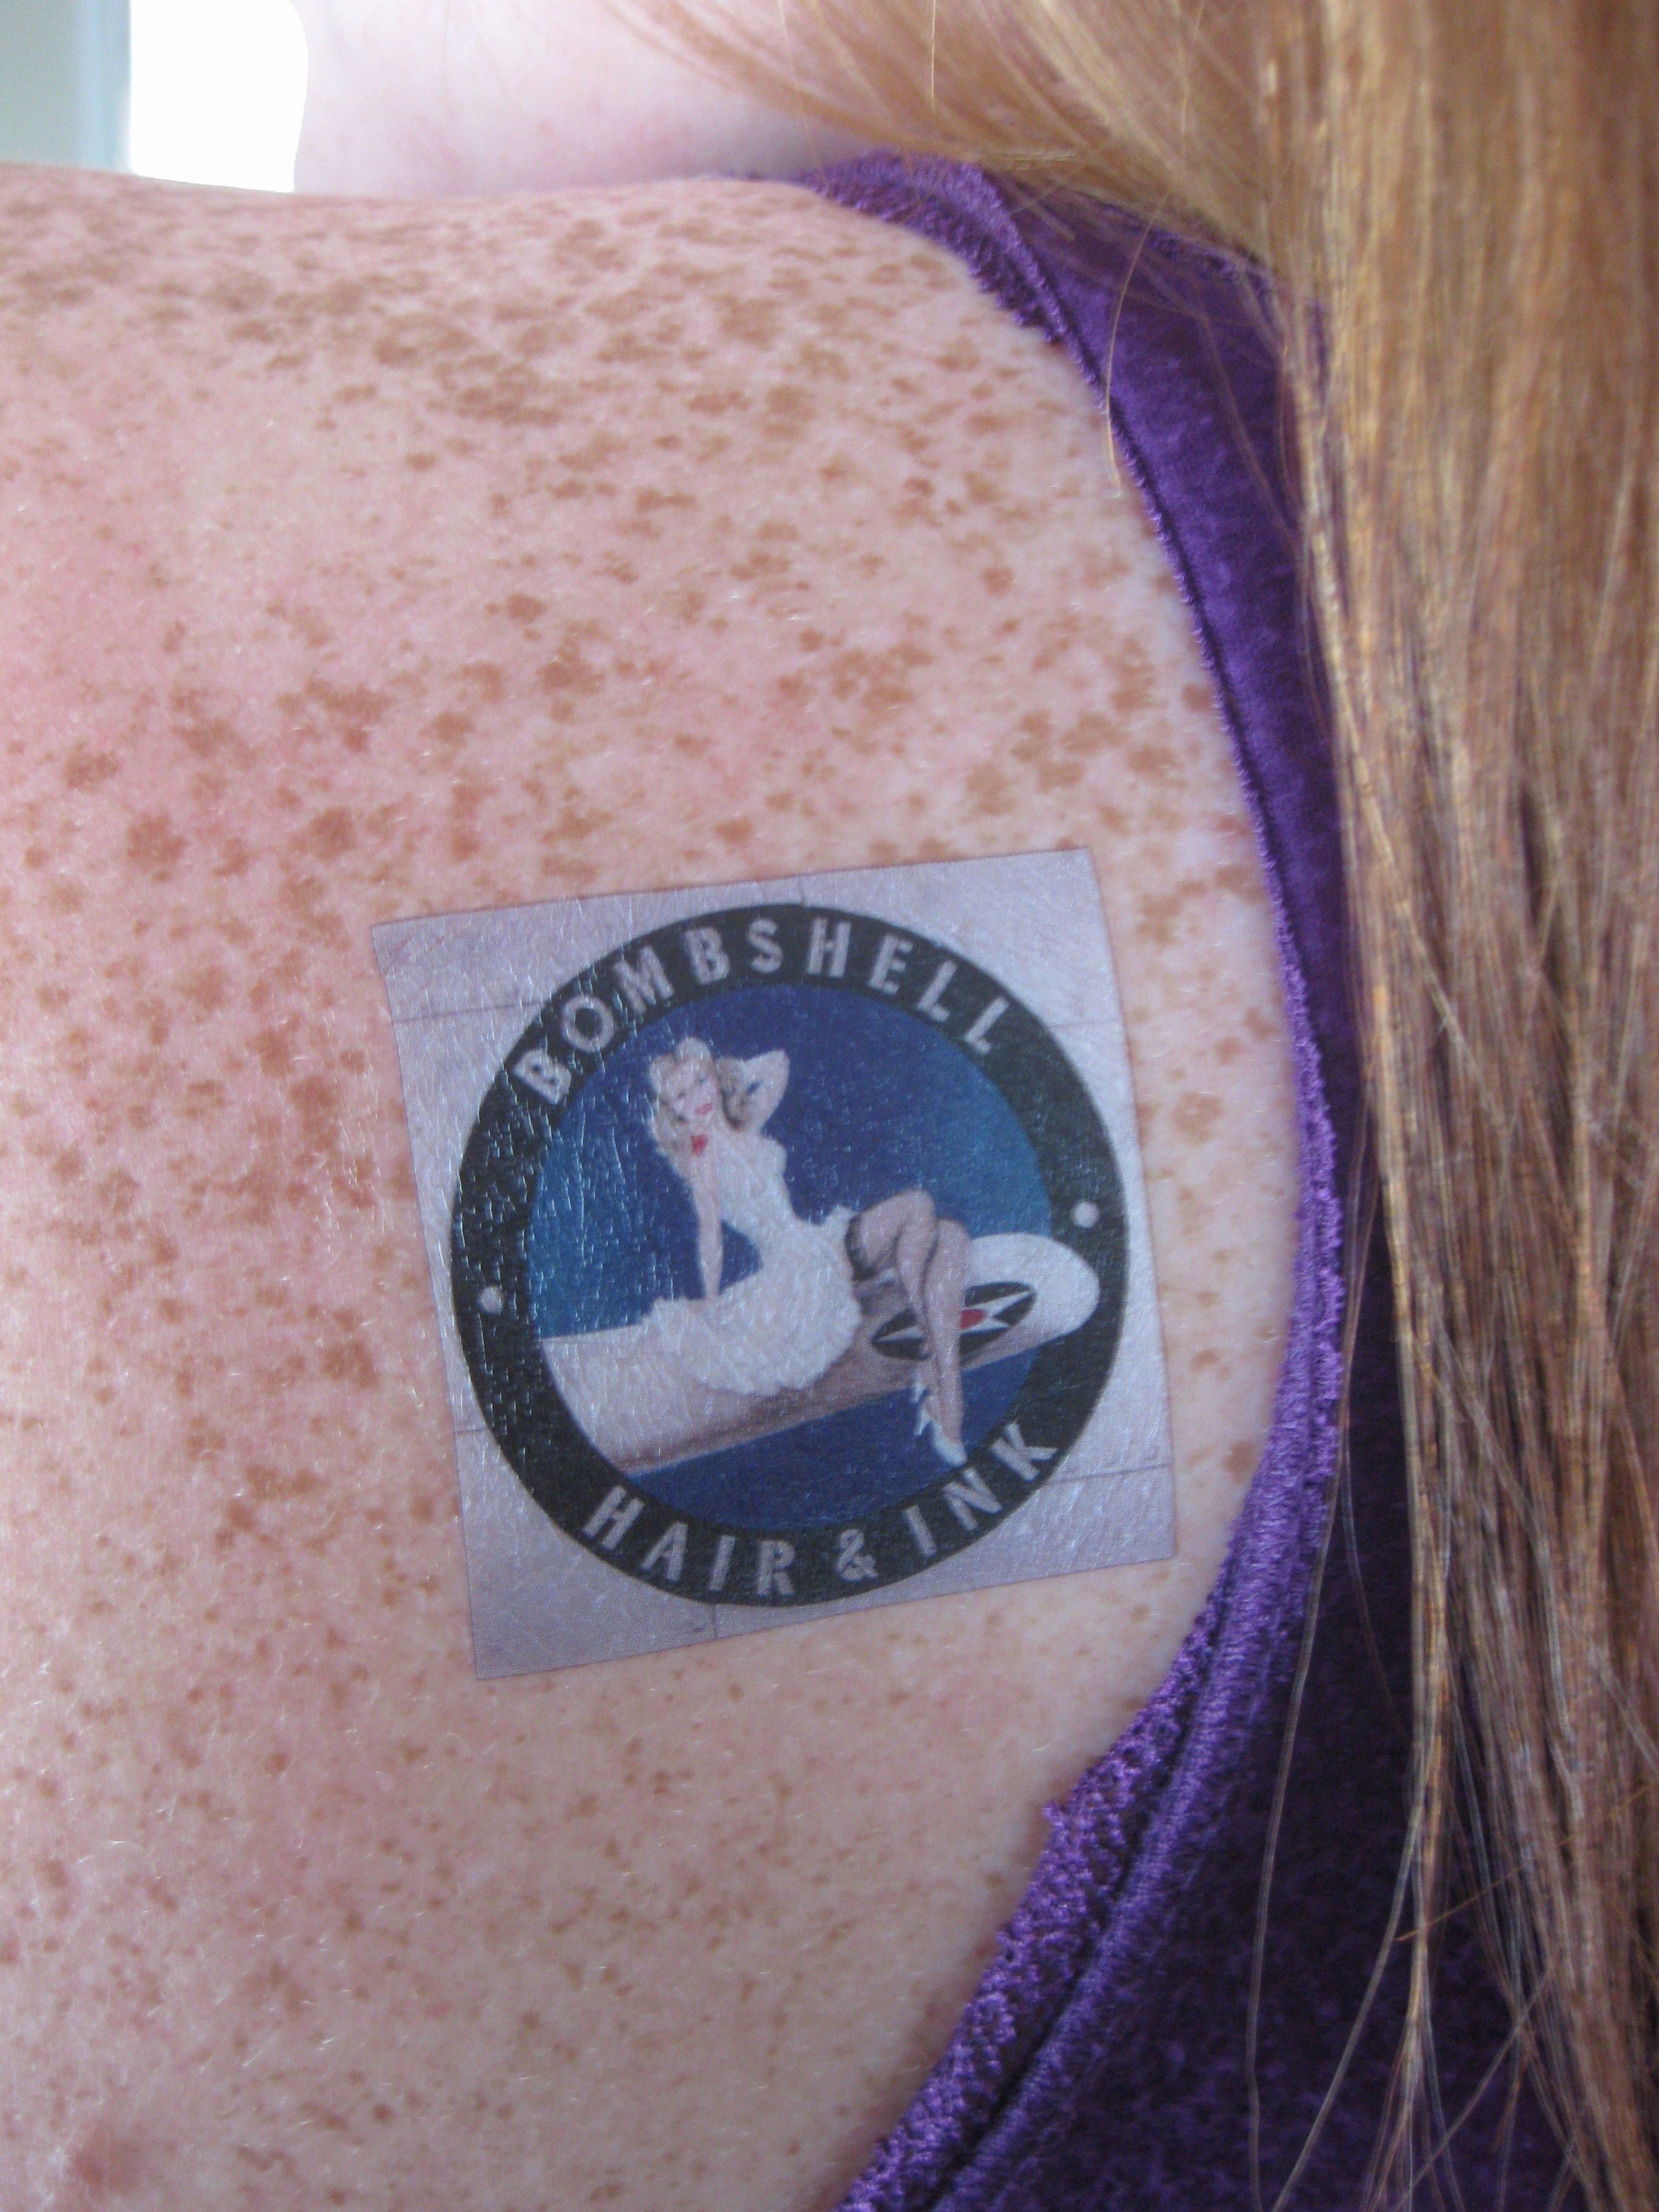 Tattoo Shop Business Cards Fresh Tattoo Shop Marketing Ideas